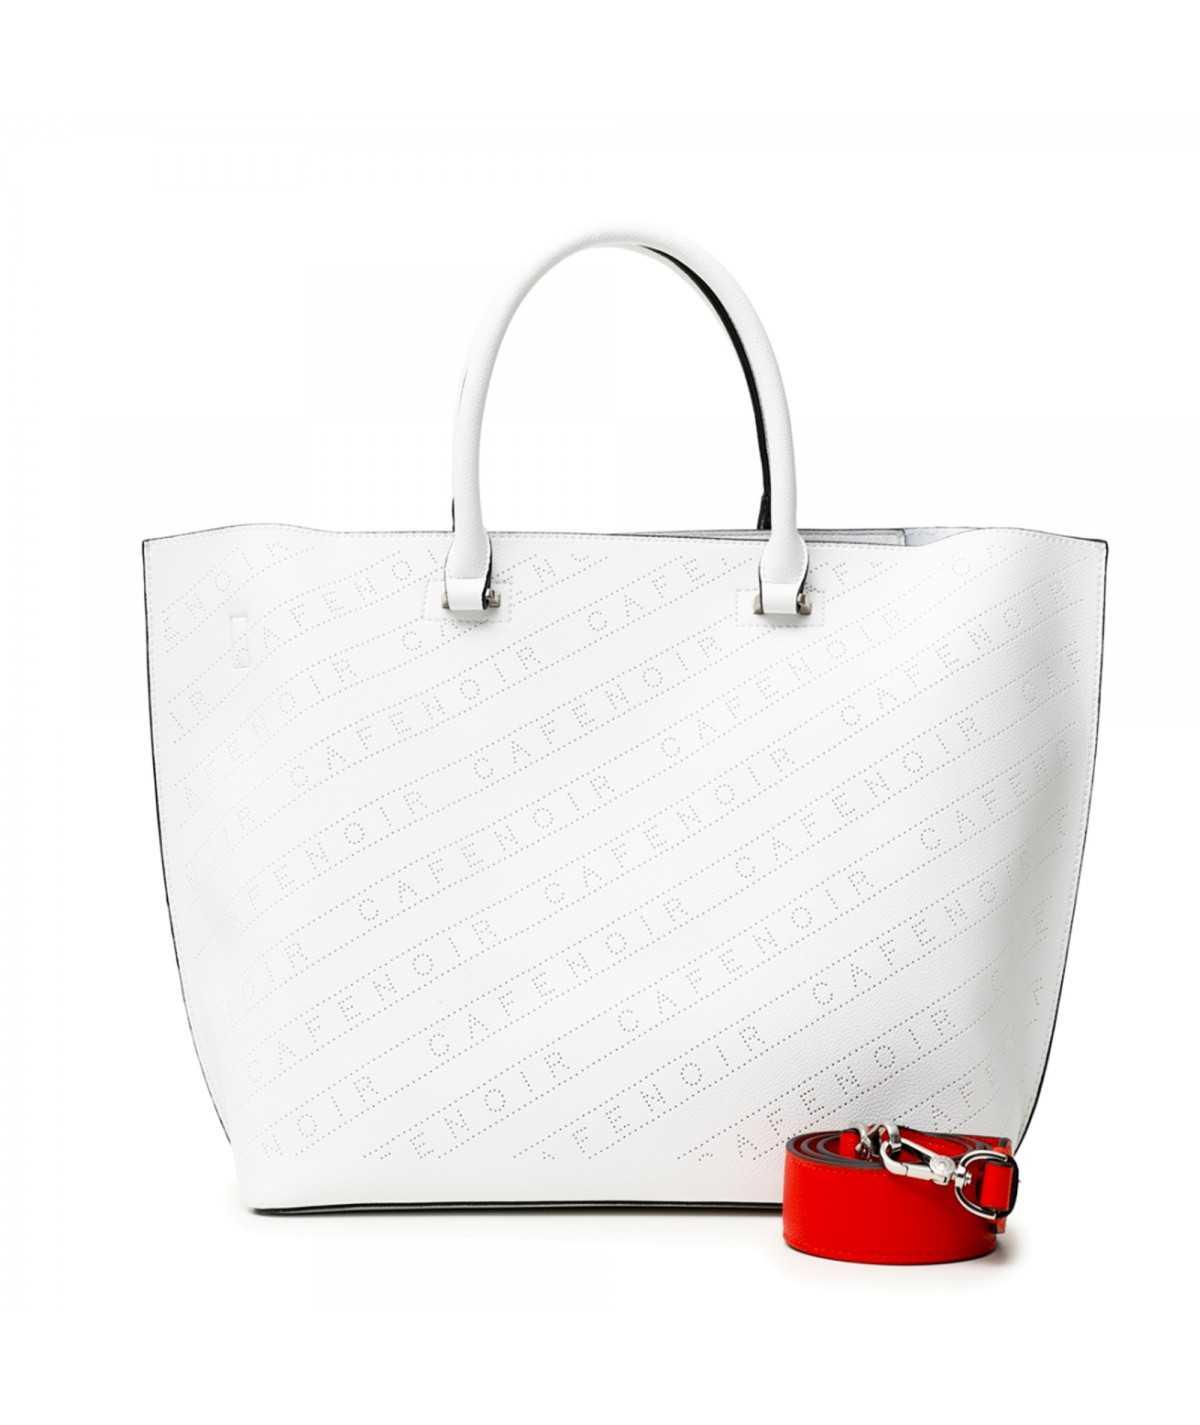 CAFèNOIR Shopping Bag